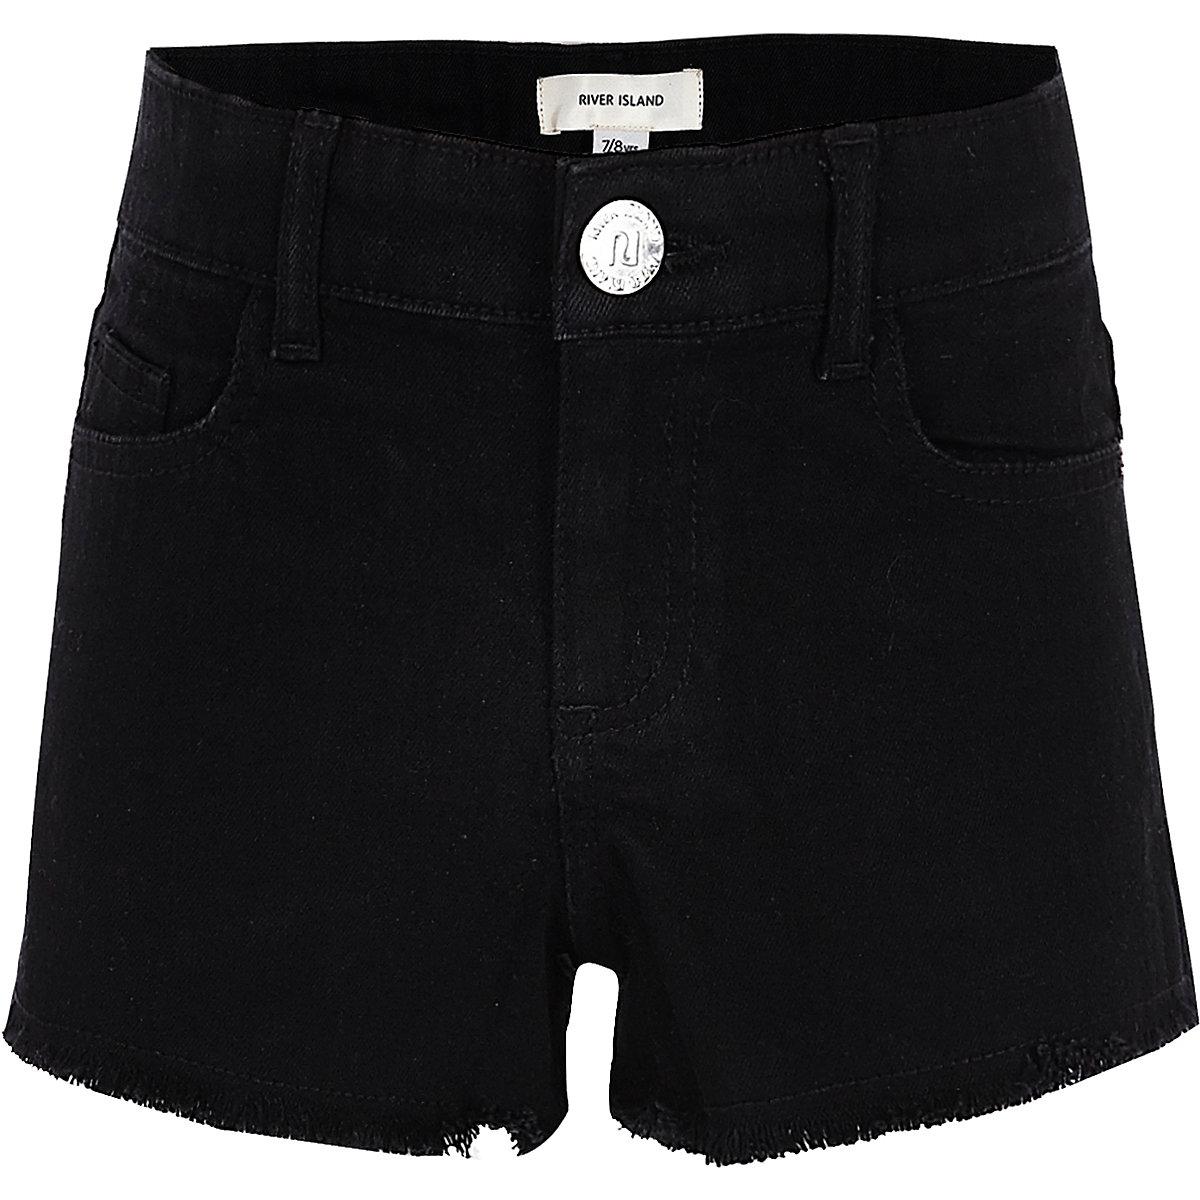 Girls Black Frayed Hem Denim Shorts Holiday Shop Sale Long Mickey